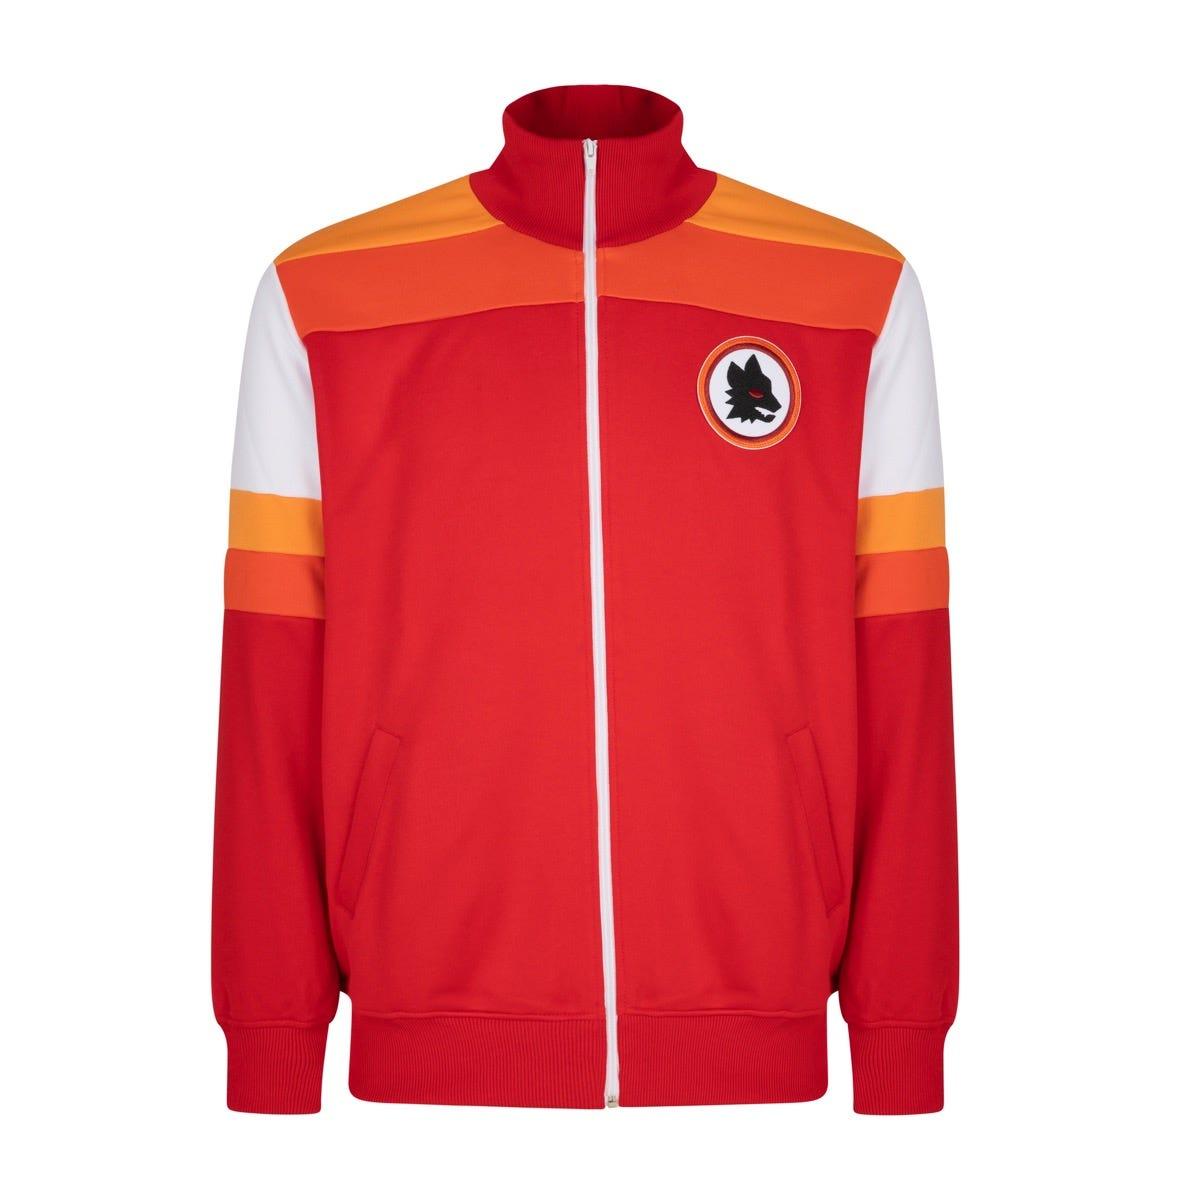 Men's AS ROMA Retro 1979/80 zip-up jacket – red